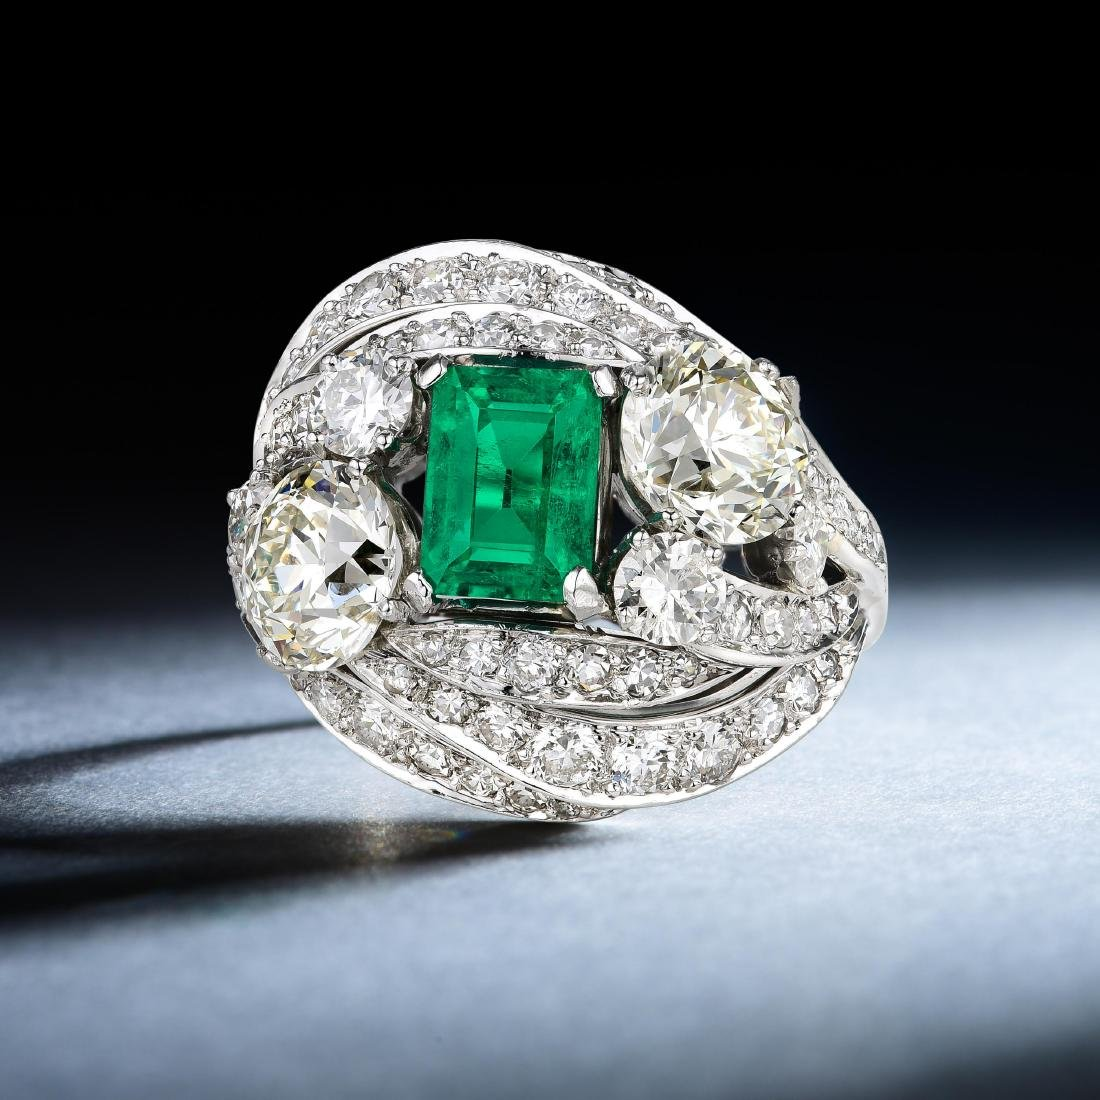 Ruser 1.44-Carat No Oil Colombian Emerald Diamond Ring